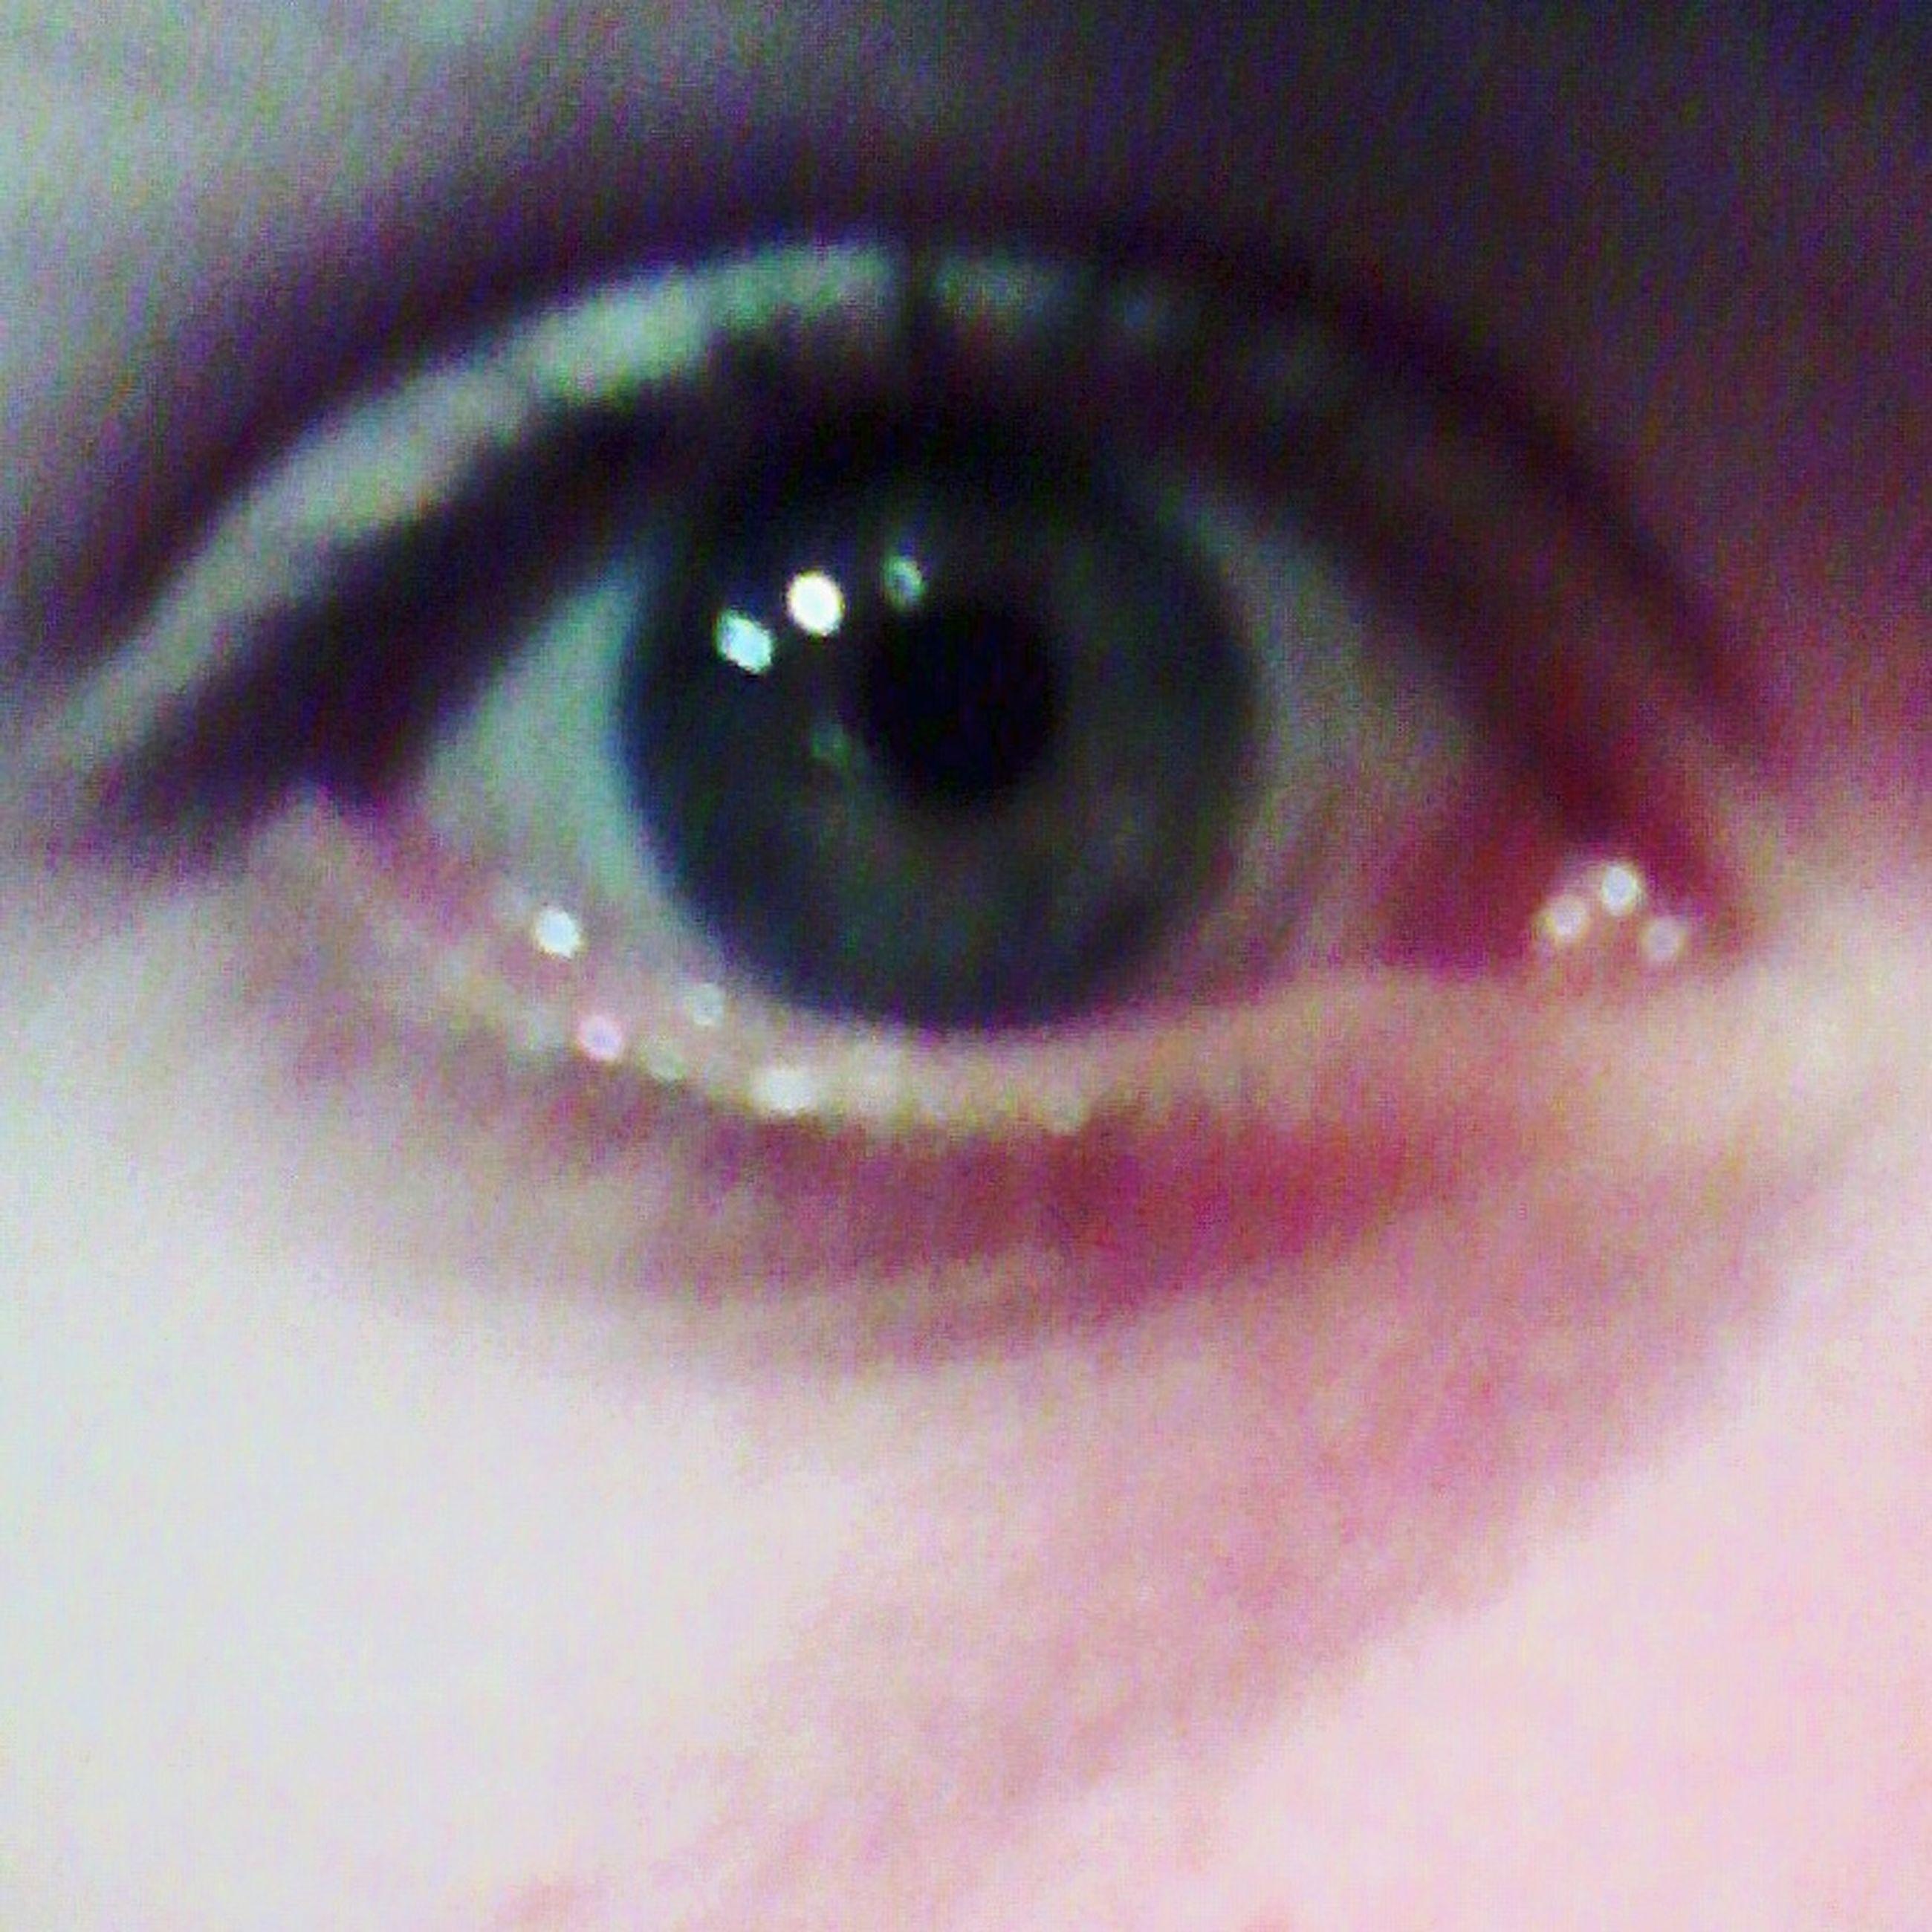 human eye, close-up, eyelash, eyesight, indoors, extreme close-up, part of, sensory perception, extreme close up, full frame, reflection, looking at camera, eyeball, selective focus, portrait, unrecognizable person, backgrounds